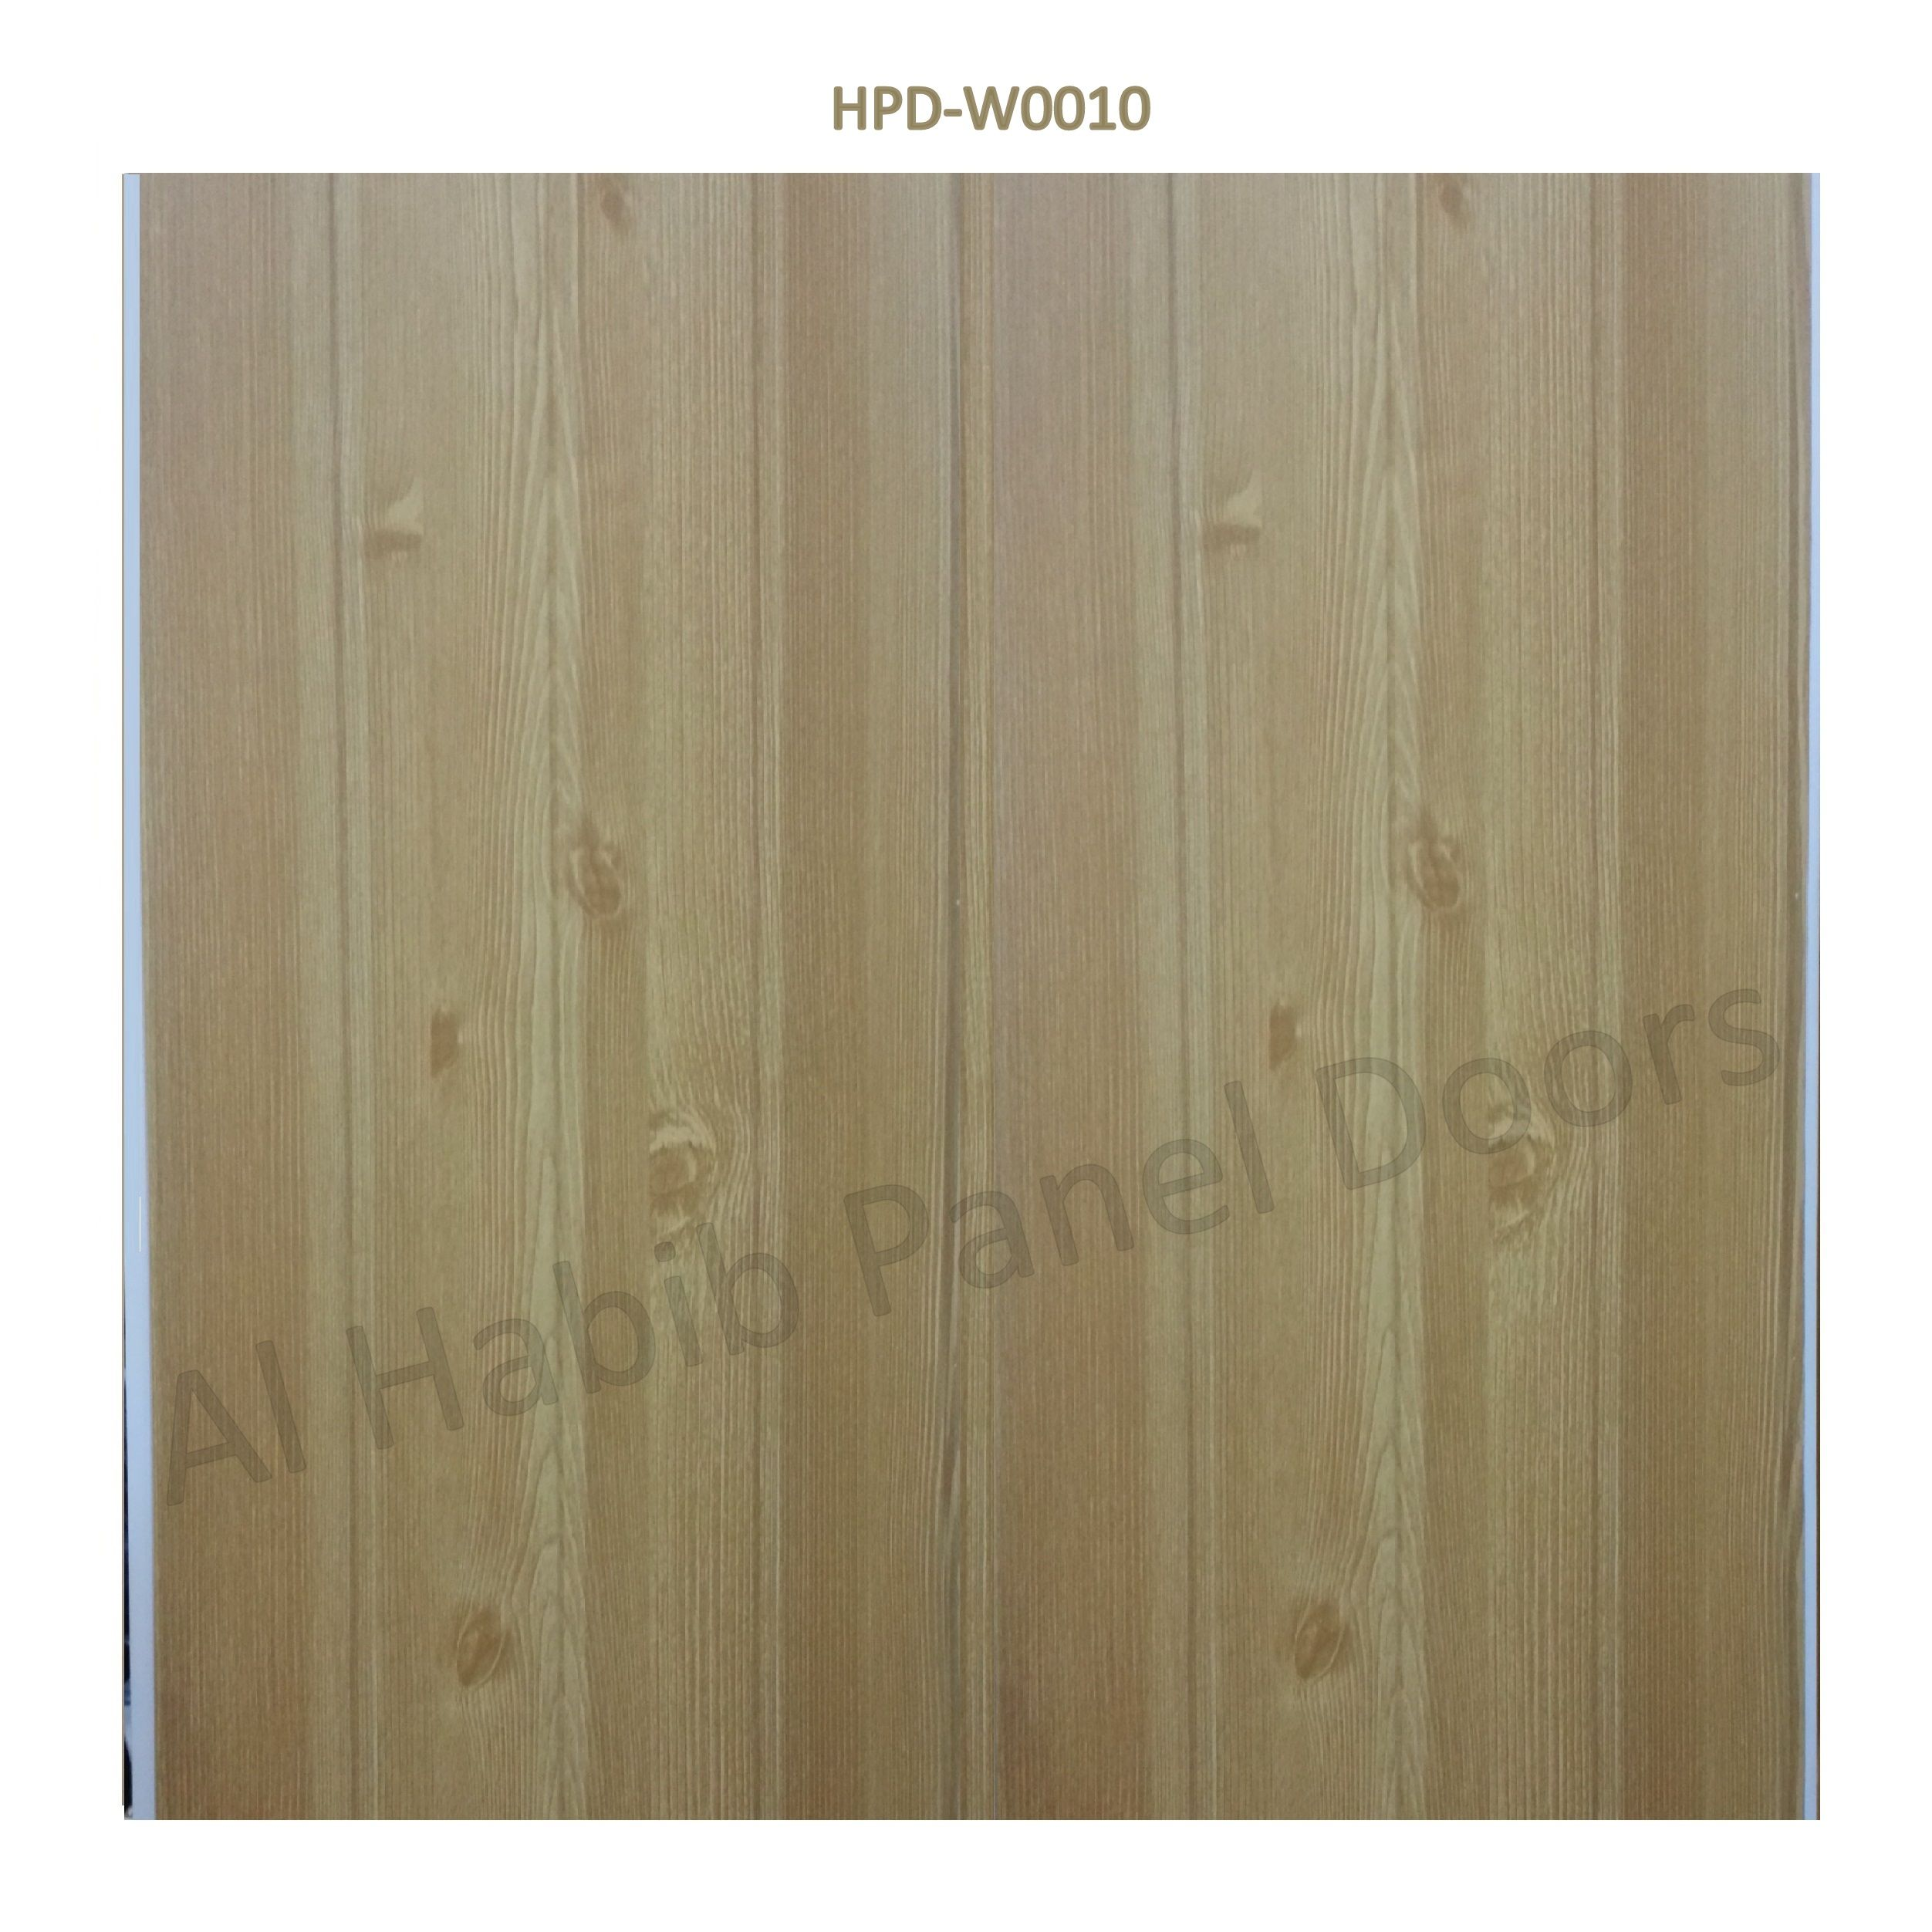 Lovely Wood Grain Texture Plastic Wall Paneling Hpdw0010   Pvc Paneling   Al Habib  Panel Doors